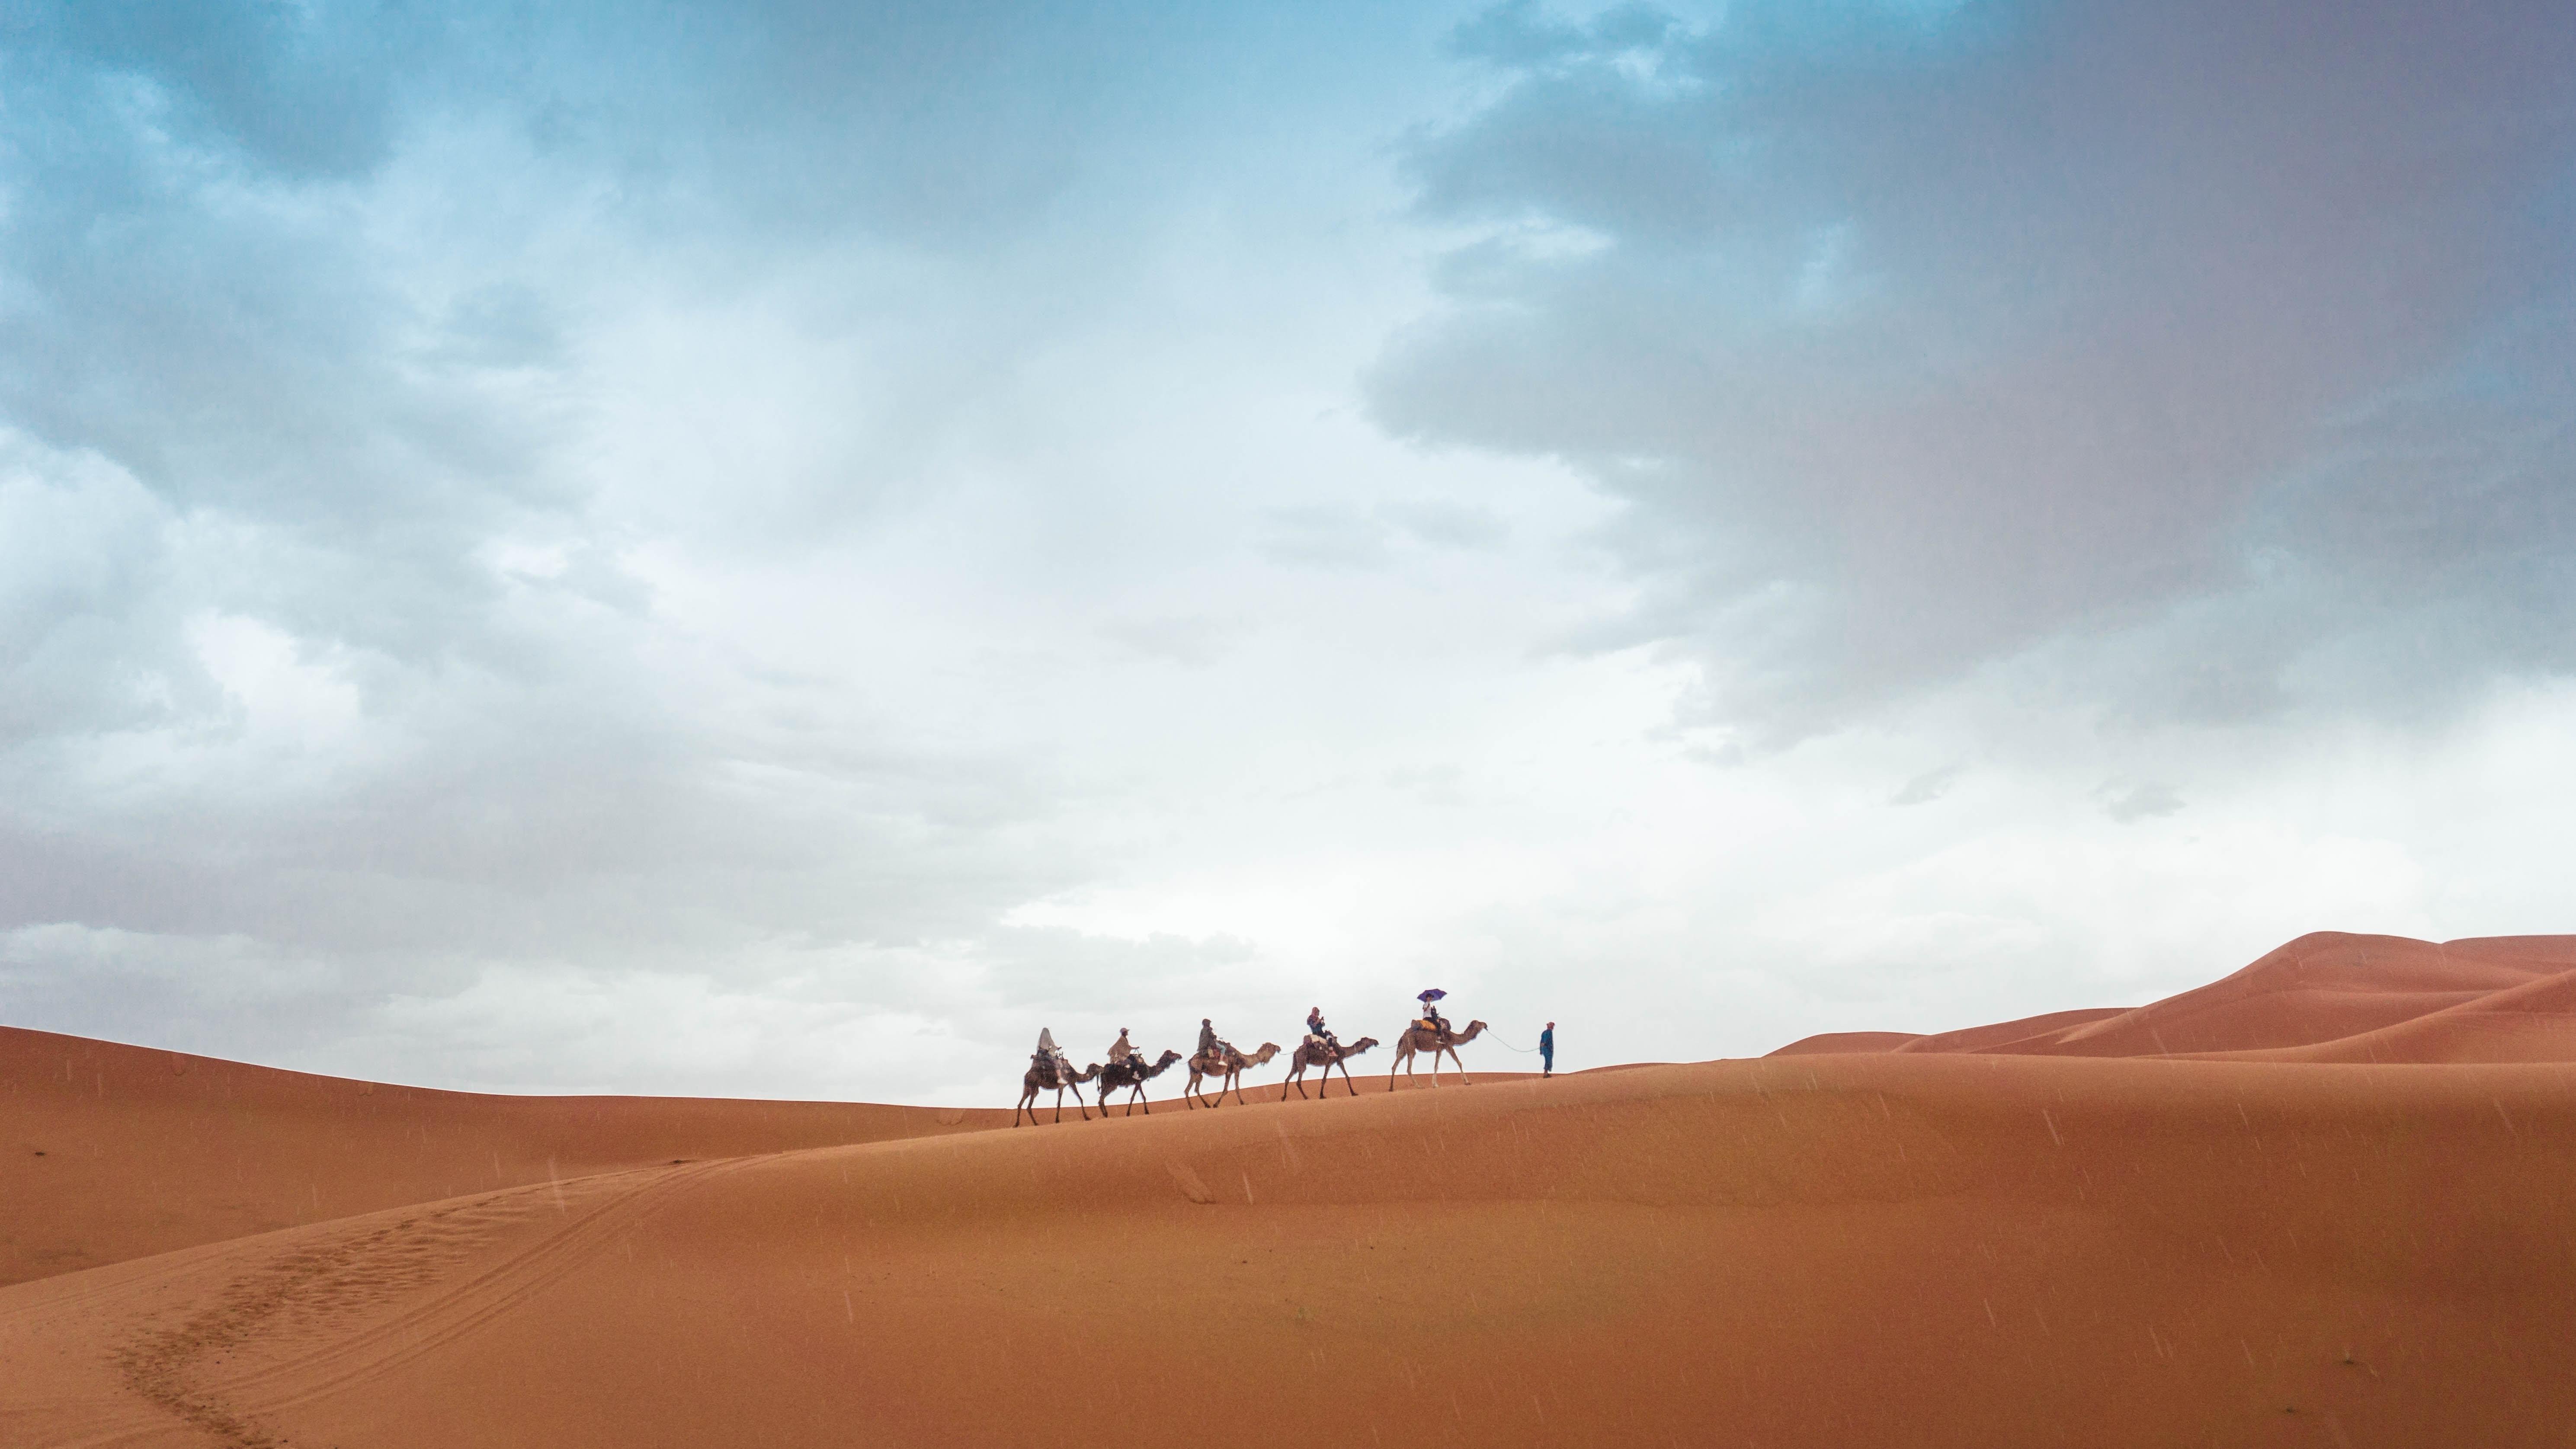 five camels walking on sand during daytime